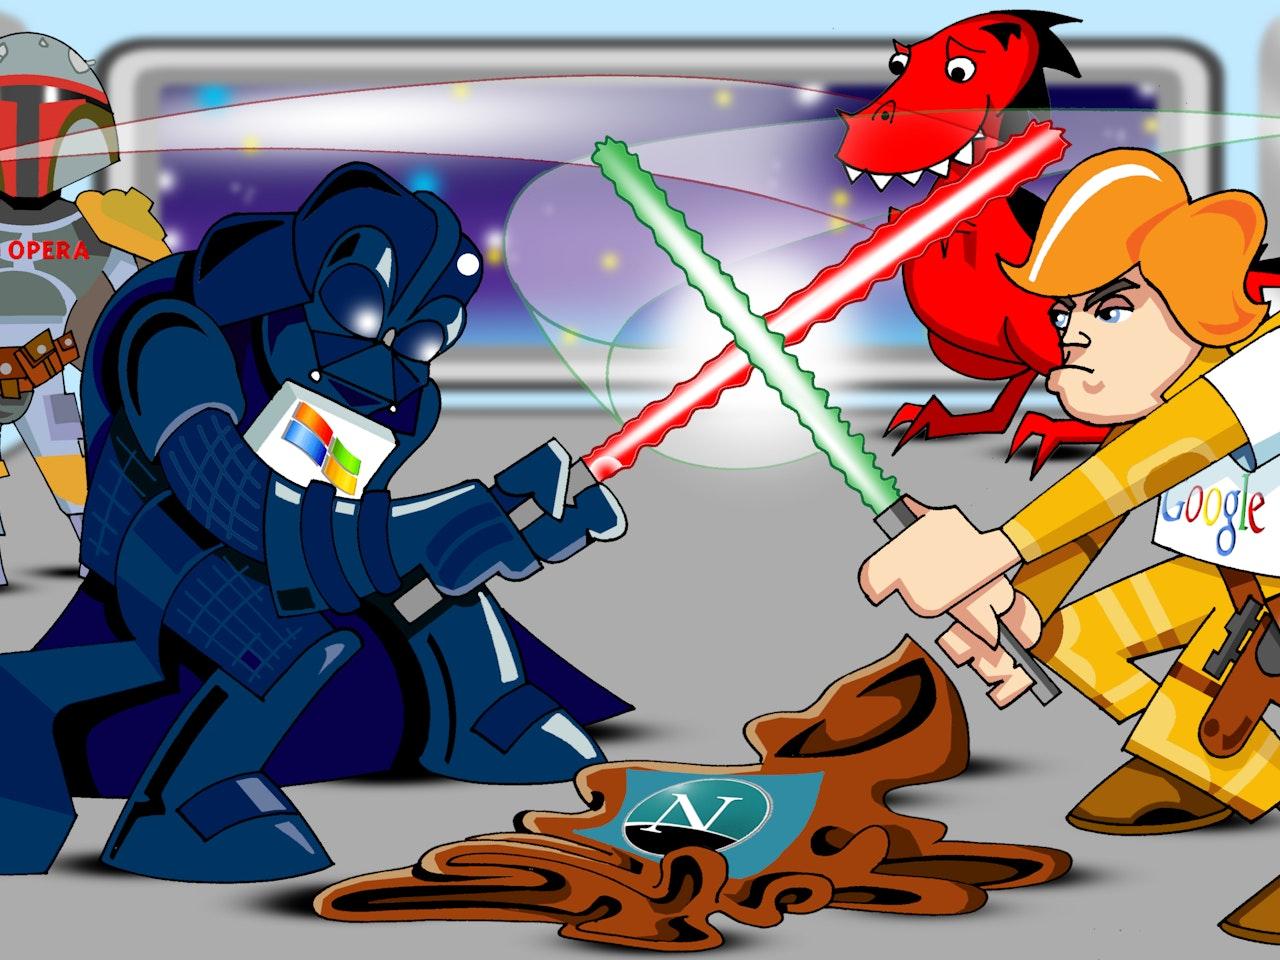 science fiction funny happy humorous comical colourful graphic cartoon star wars darth vader ben kenobi  luke skywalker boba fett  lightsabre fight